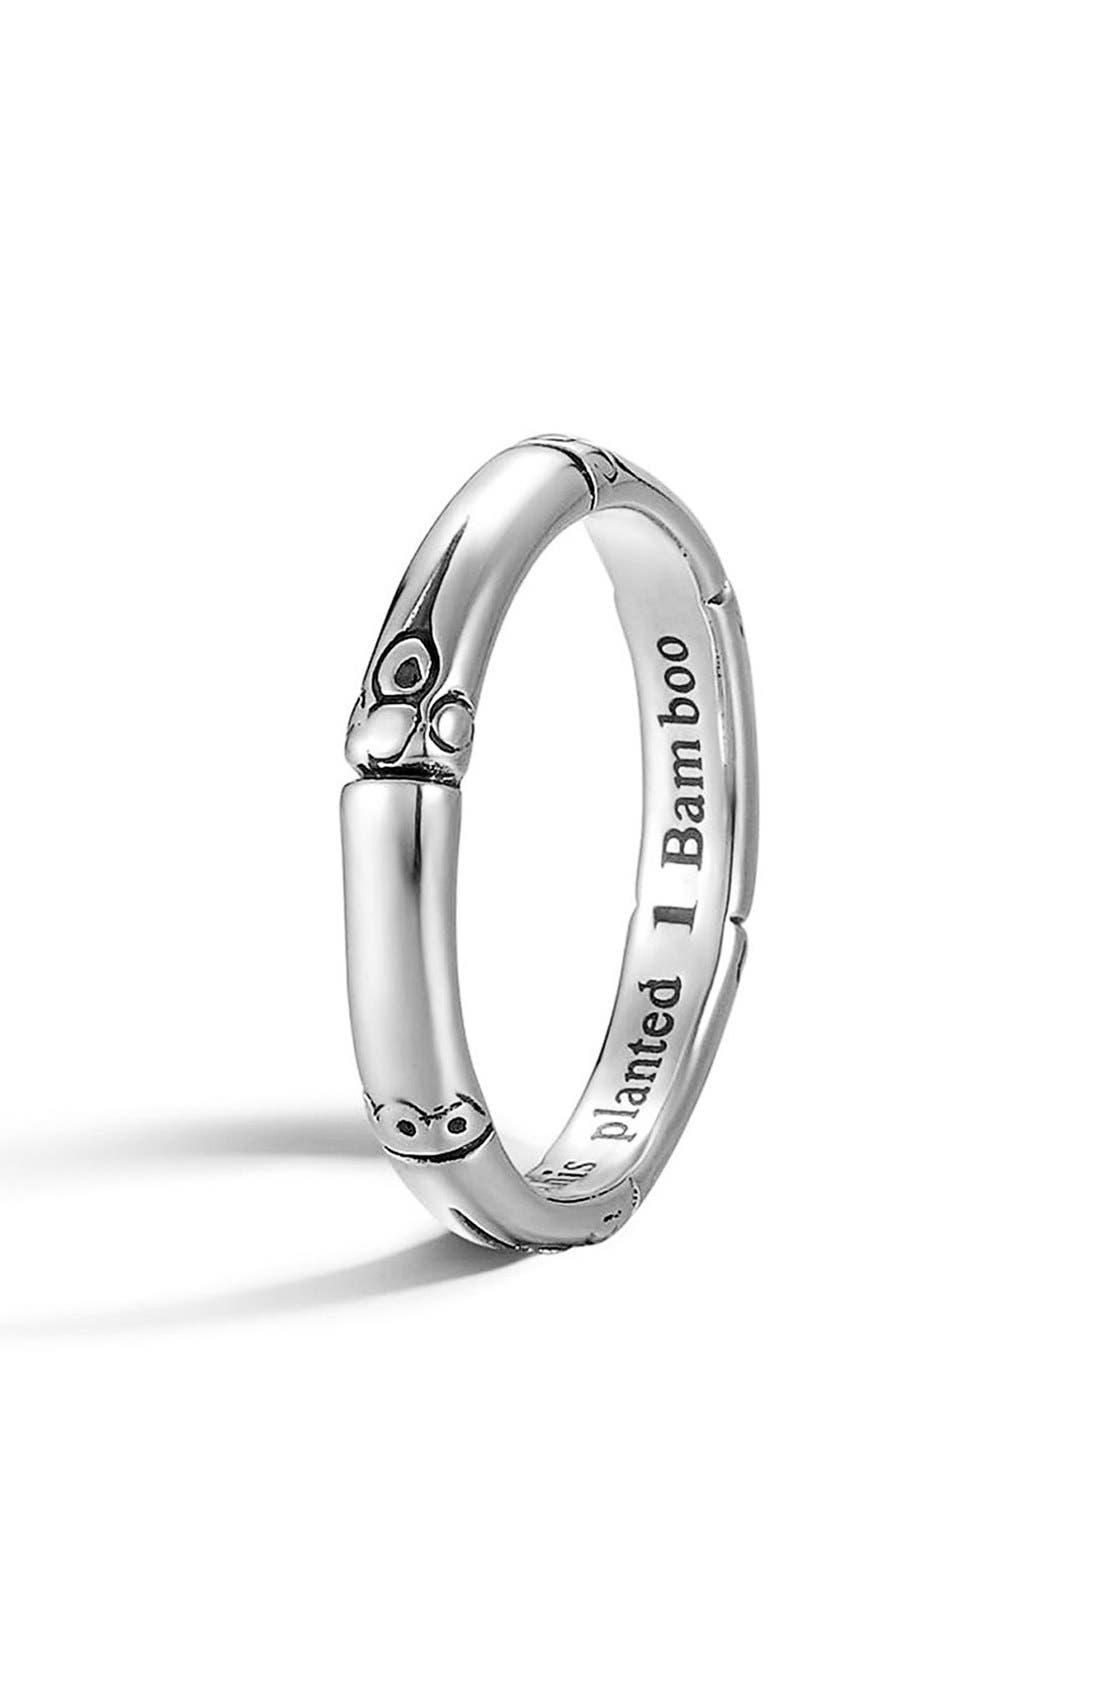 Main Image - John Hardy 'Bamboo' Silver Ring